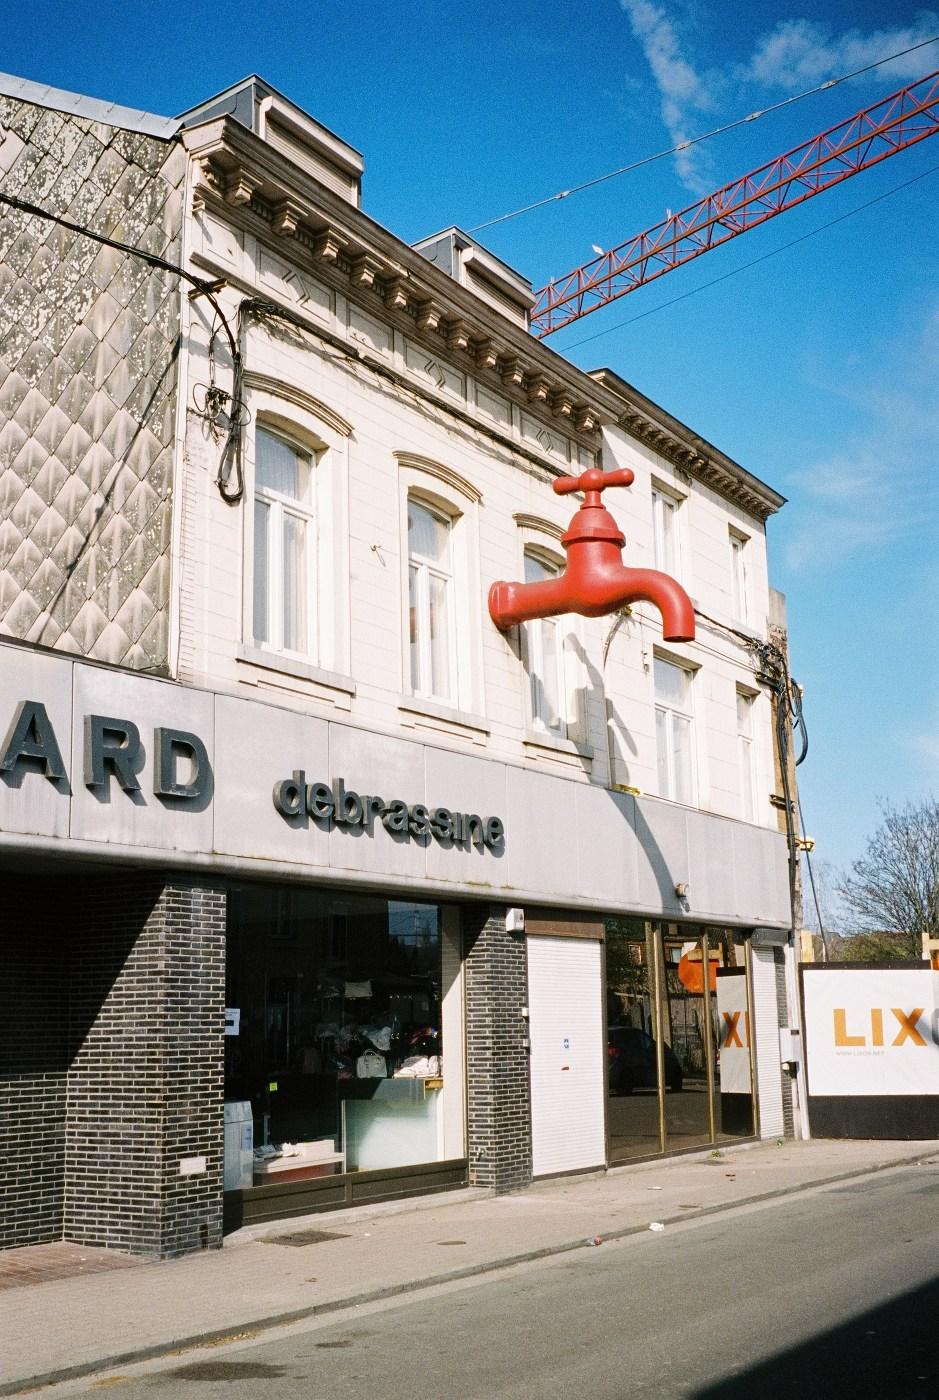 000013JoergBergs-KodakPortra400-MeinFilmLab-M7-35 (2)